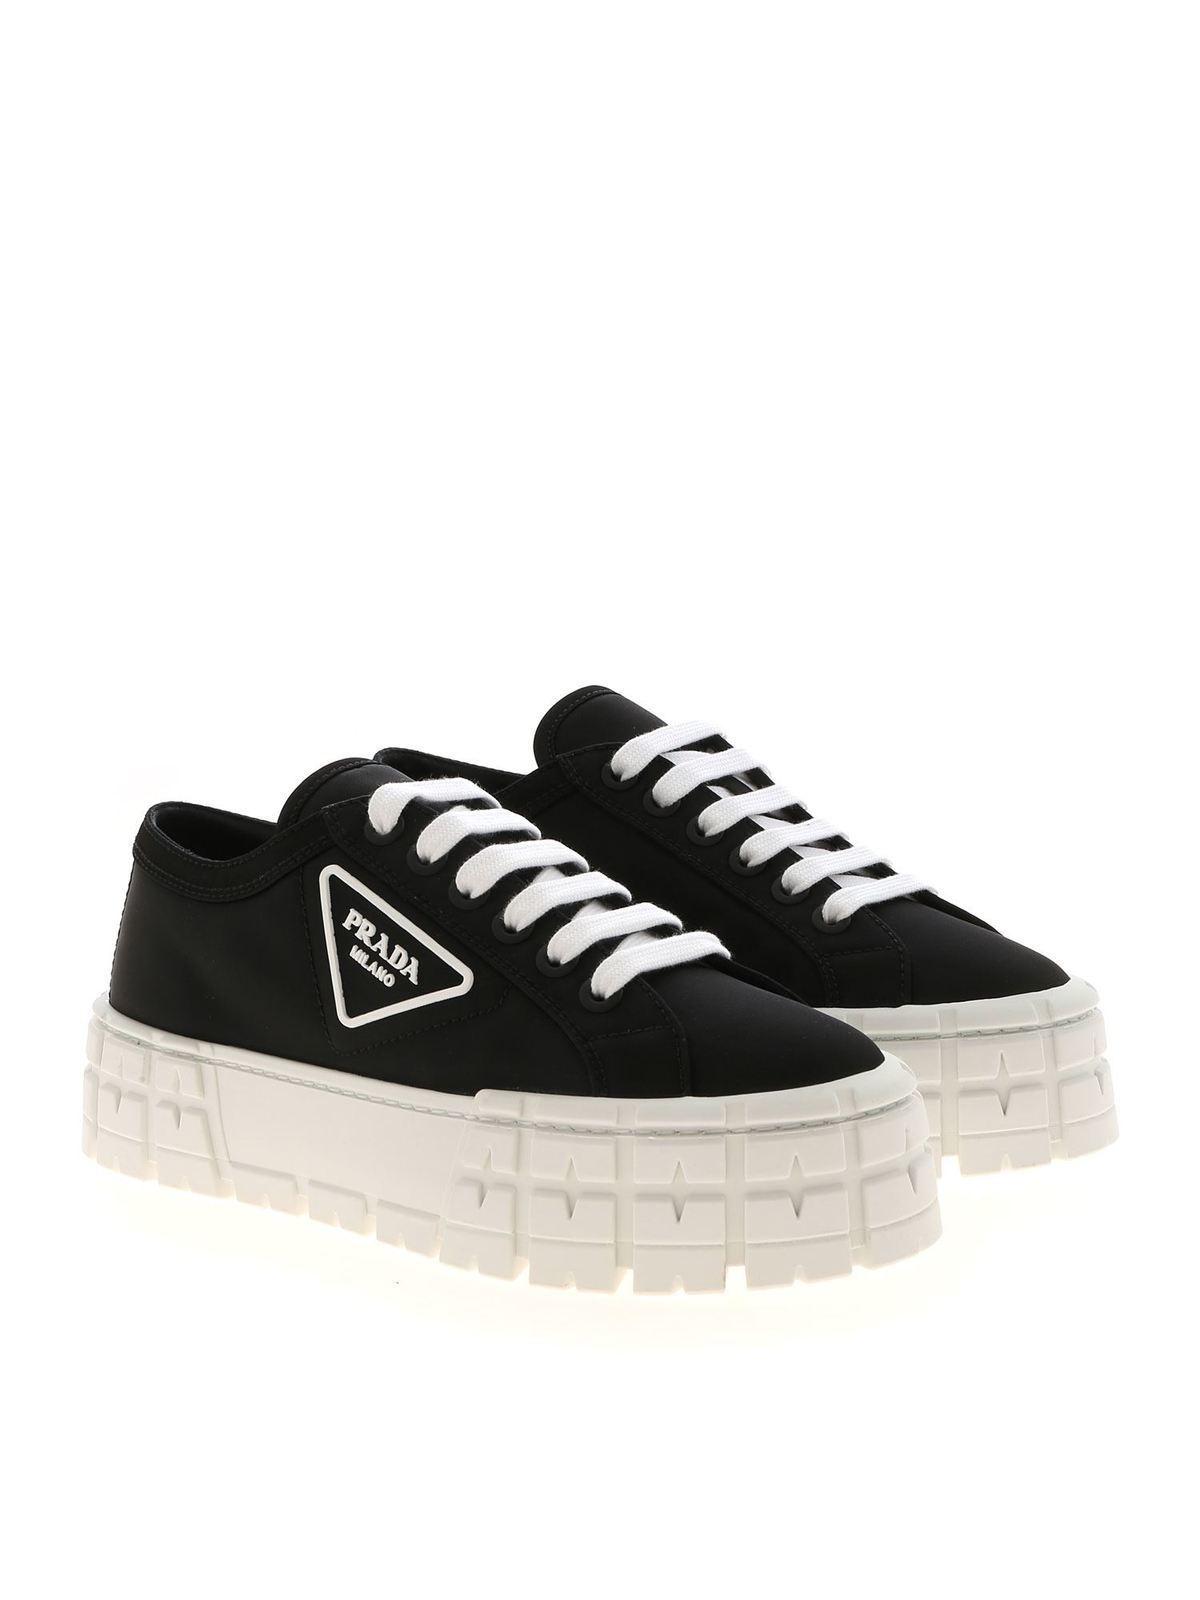 Prada - Platform sneakers in black